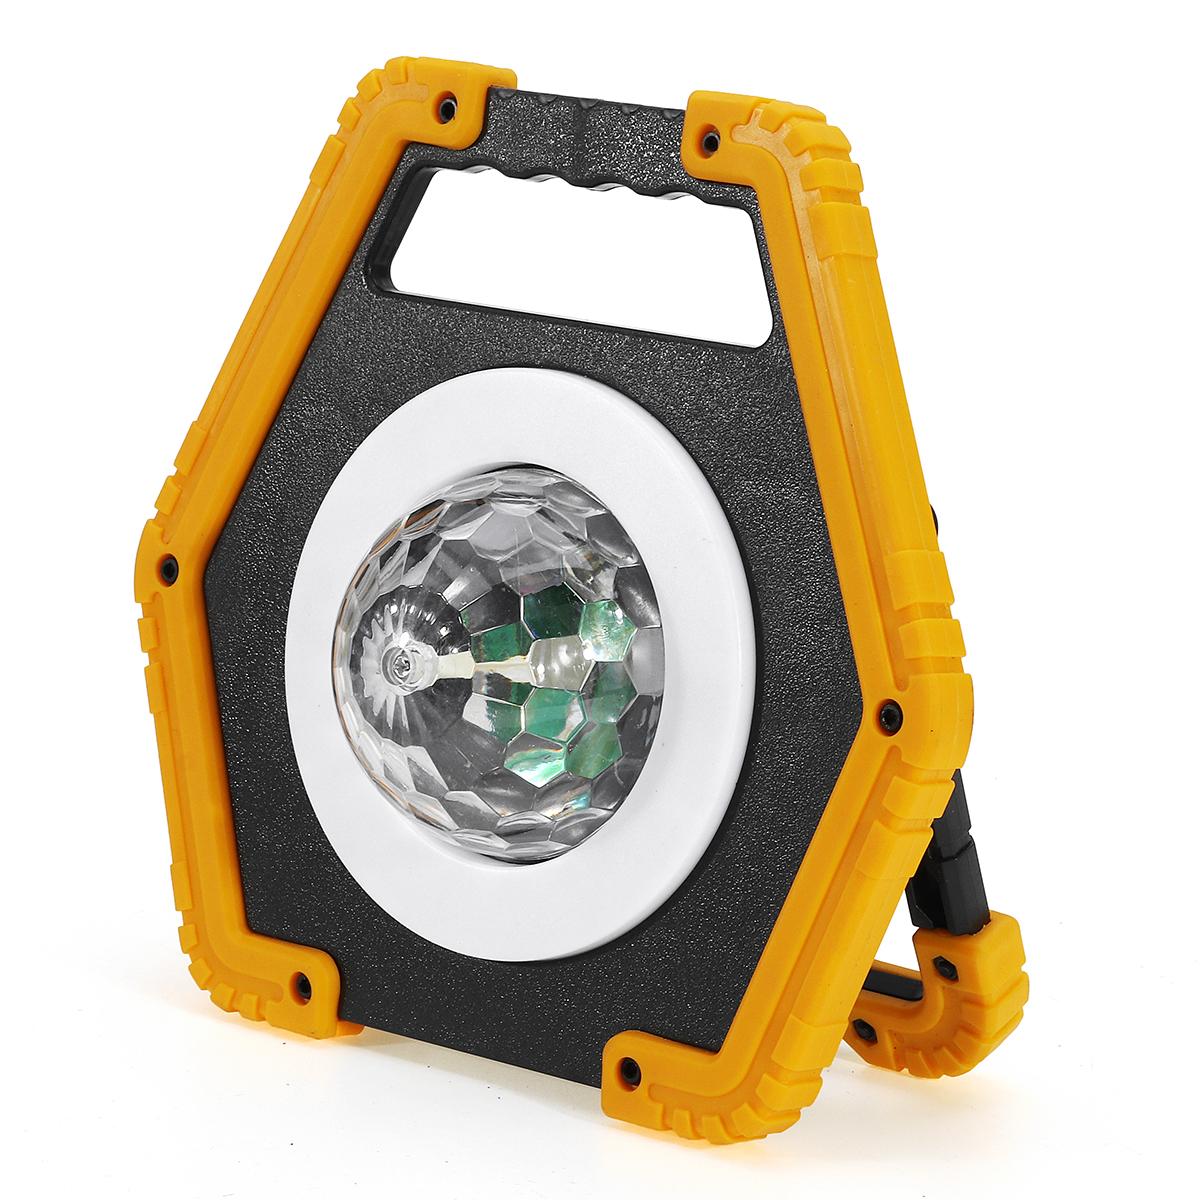 30W LED COB Work Light Spotlight Searchlight Flood Light Outdoor Camping Lantern 2 Modes Stage Lamp